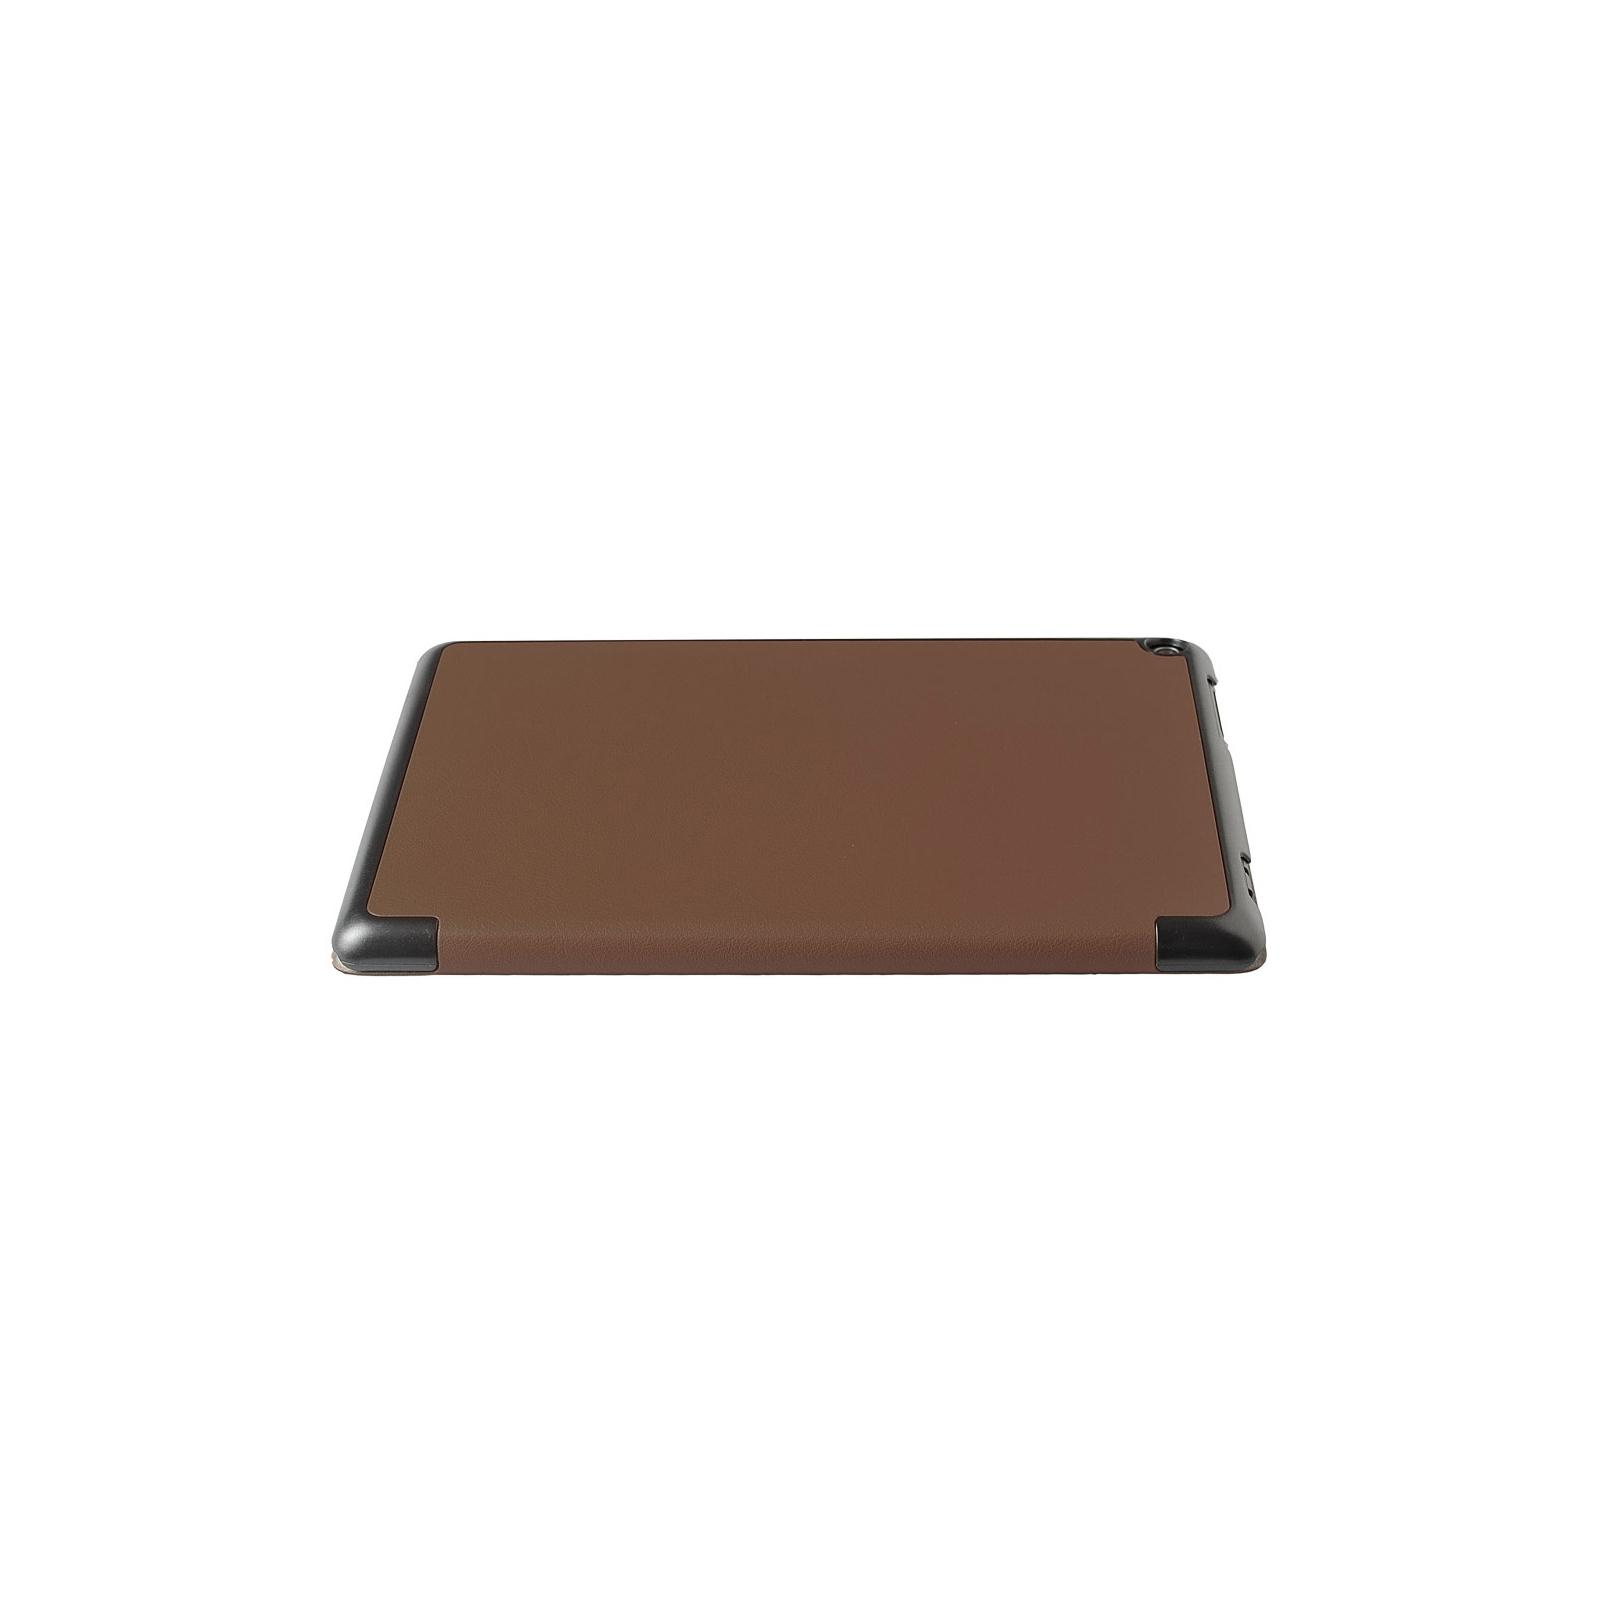 Чехол для планшета Grand-X ASUS ZenPad 10 Z300/Z300C Brown (ATC - AZPZ300BR) изображение 3